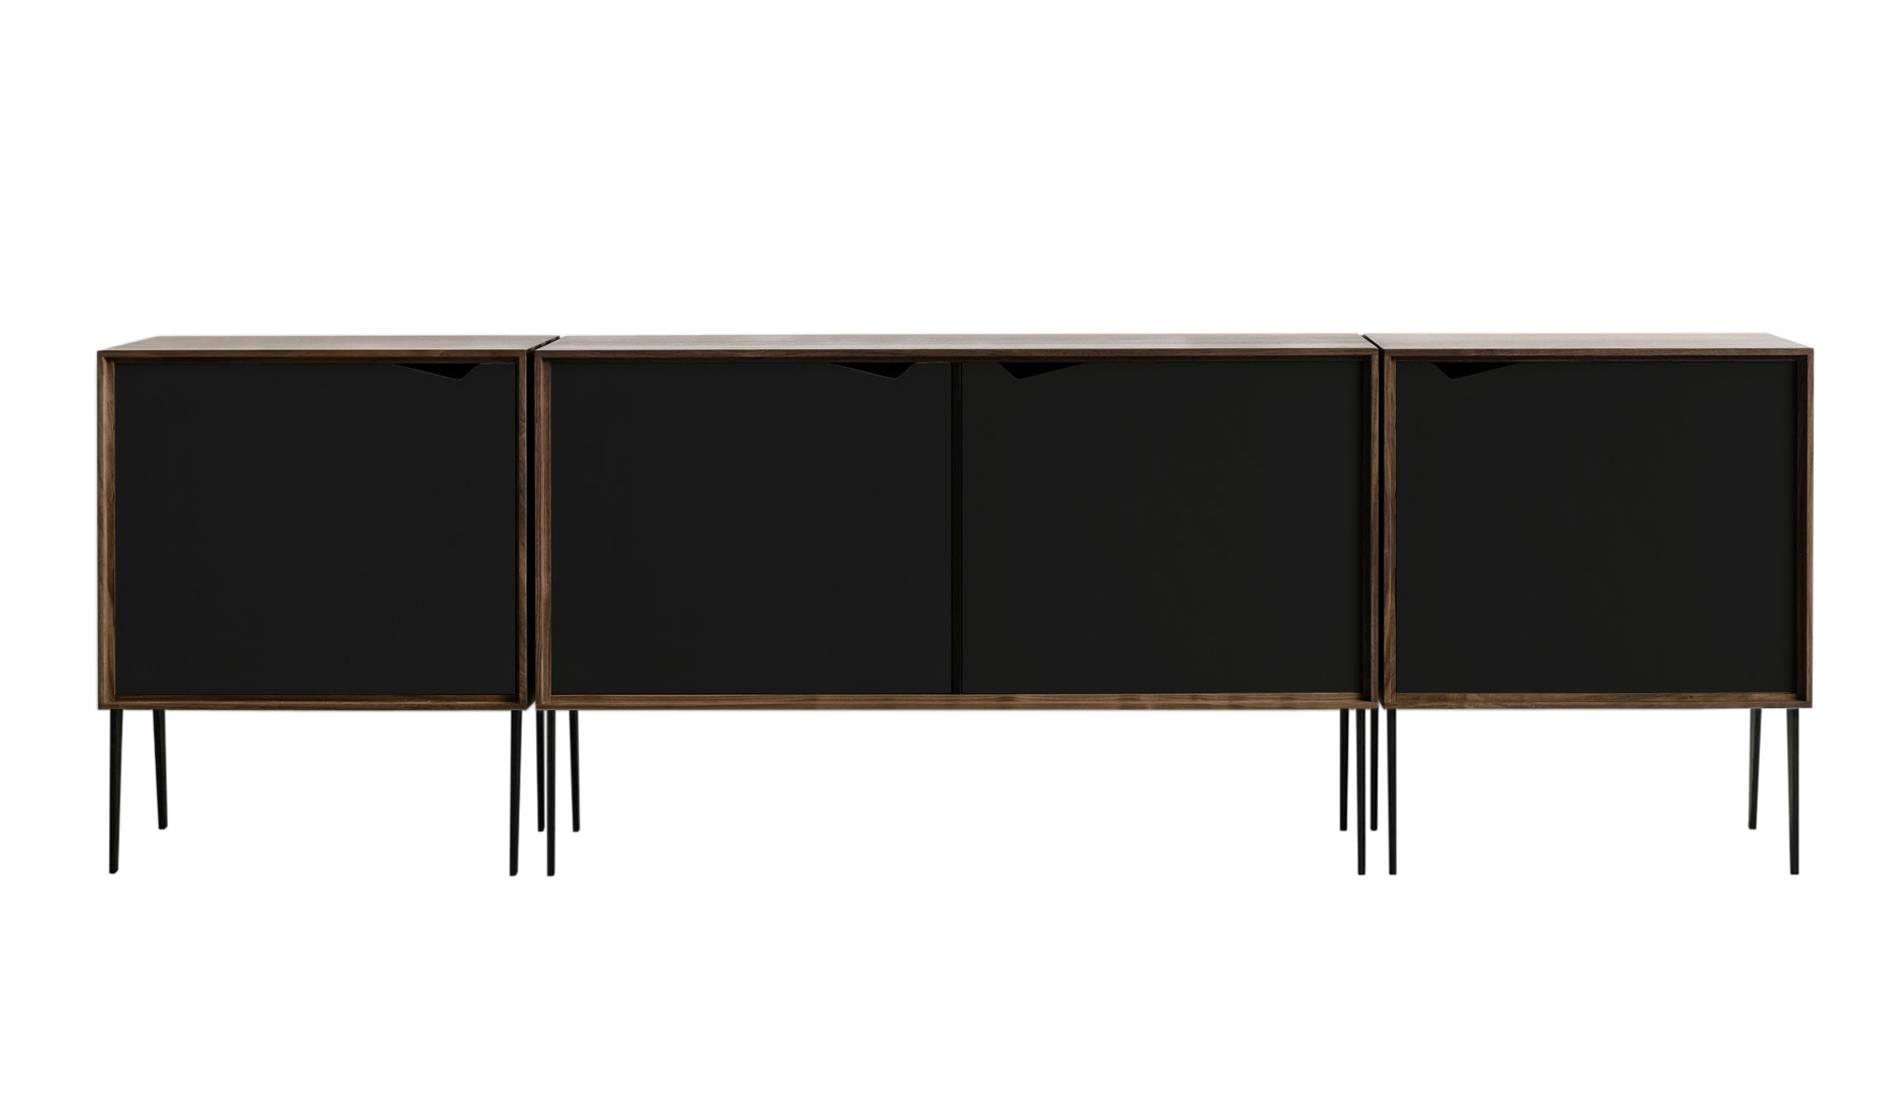 Andersen S2 Walnut / Black Sideboard | Dopo Domani Inside Black And Walnut Sideboards (#2 of 15)